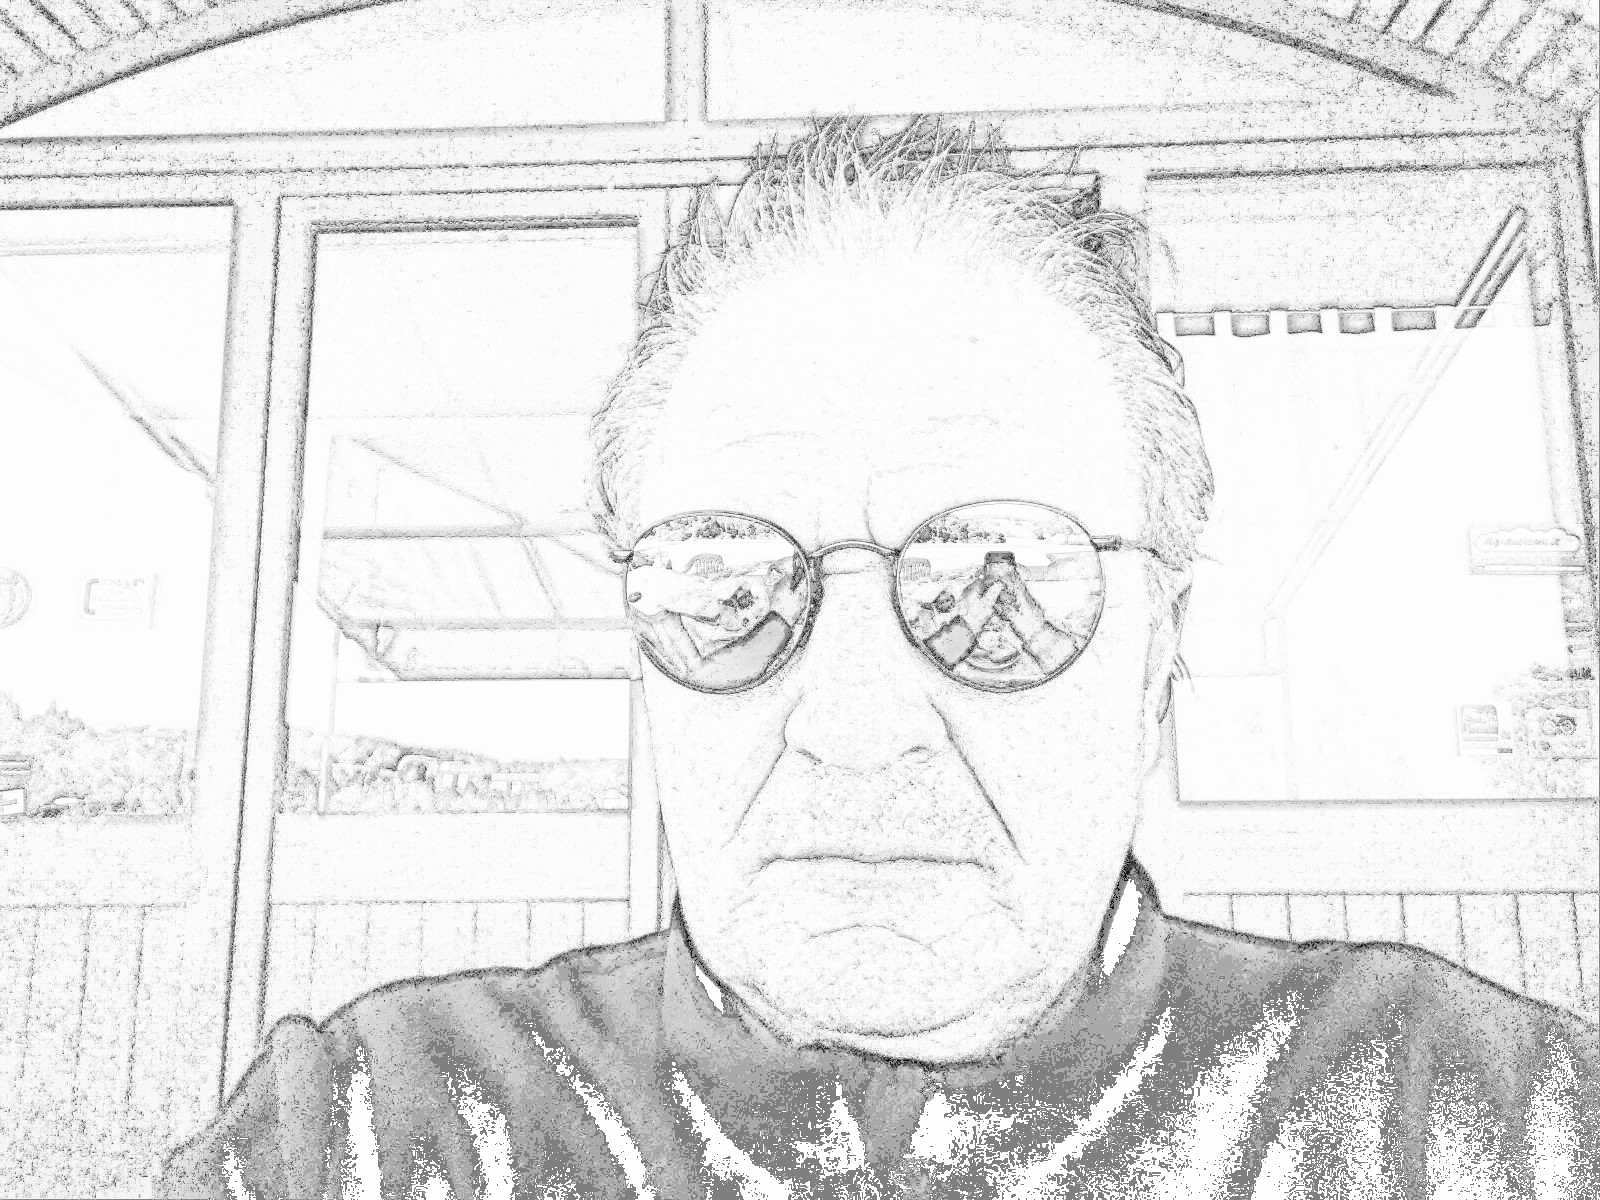 img_20150507_091651_edit.jpg